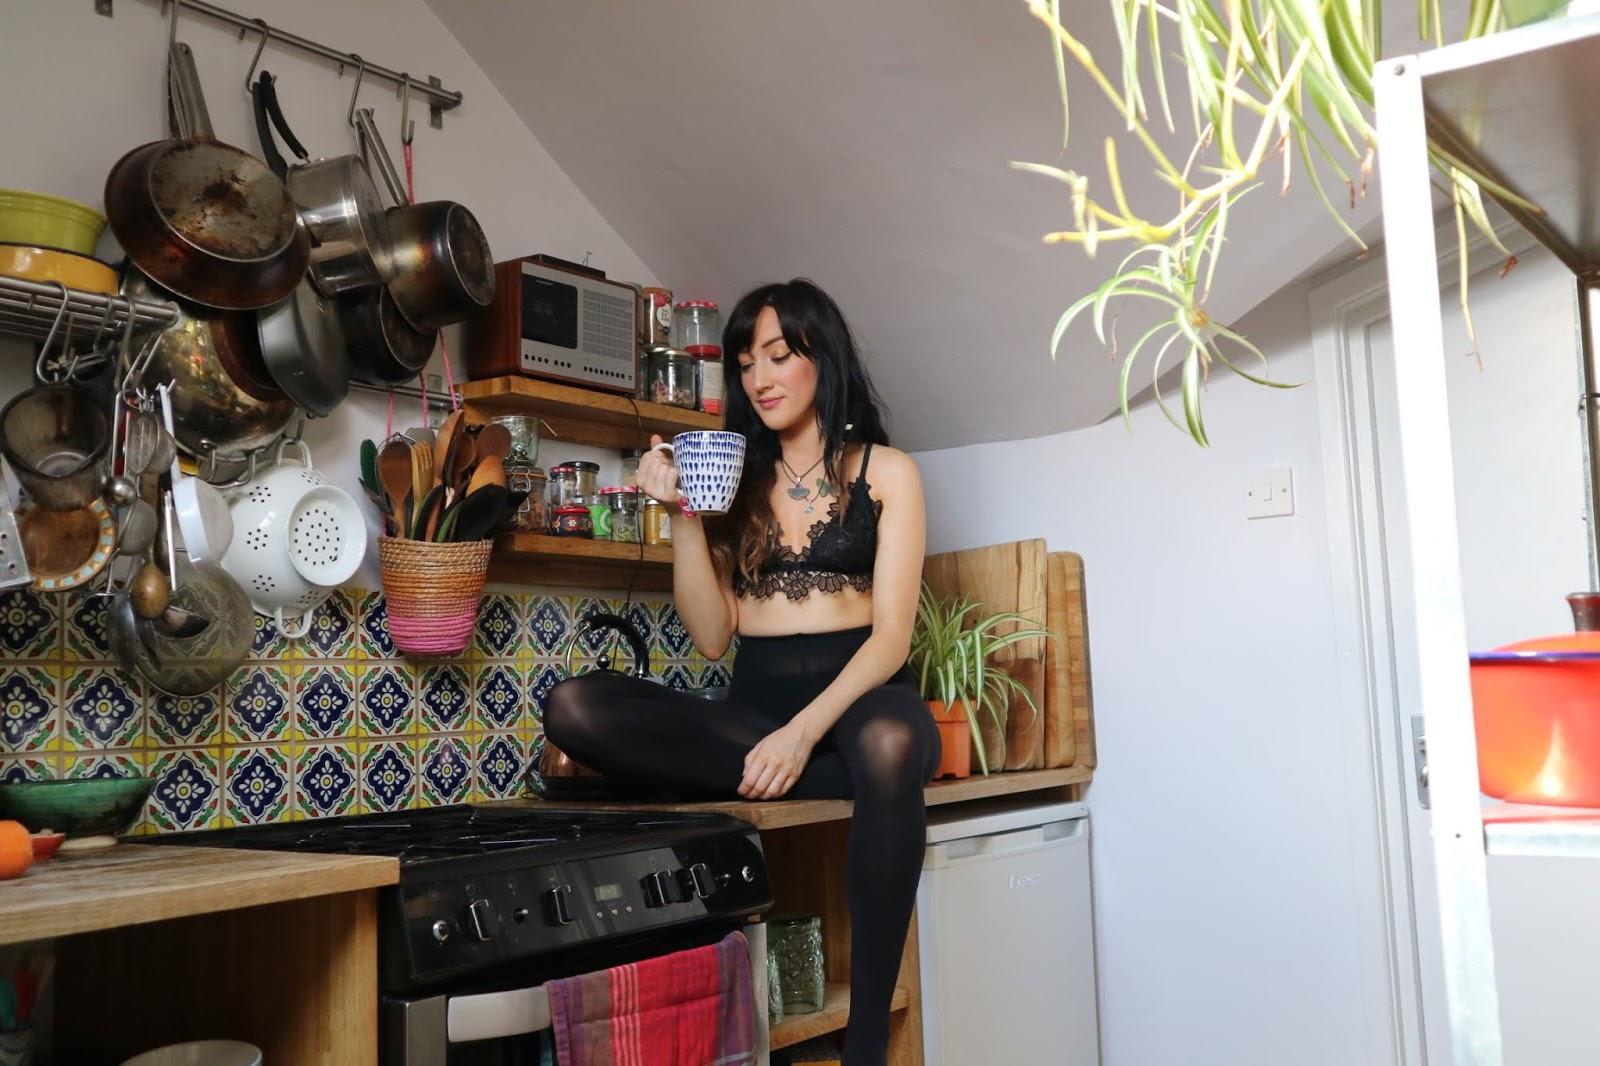 vegan fashion blogger, vegan fashion, vegan, vegan blogger, vegan food review, welsh vegan, vegan influencer